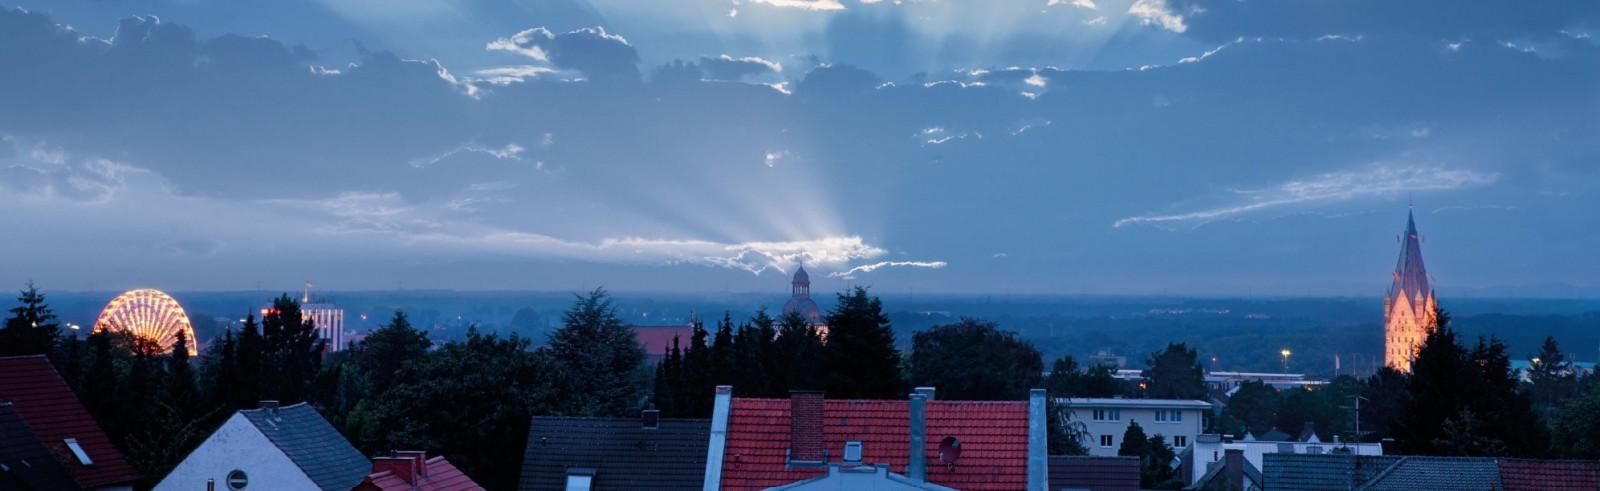 Gewerbeimmobilien in Paderborn finden